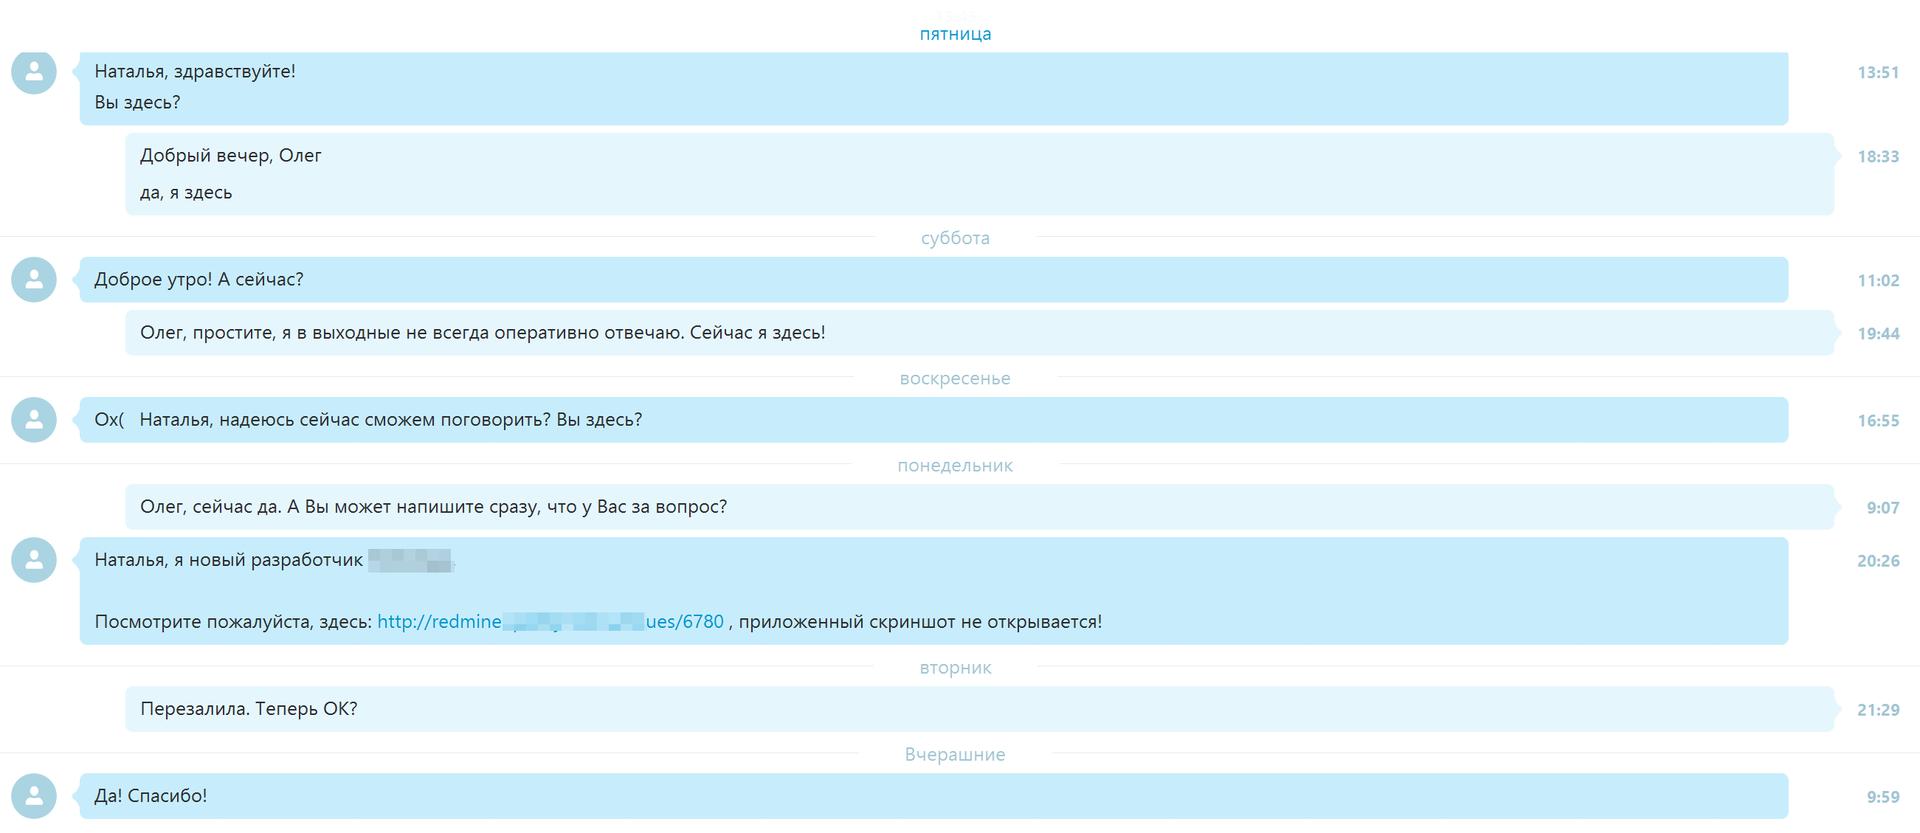 Особенности удалённых коммуникаций - 2